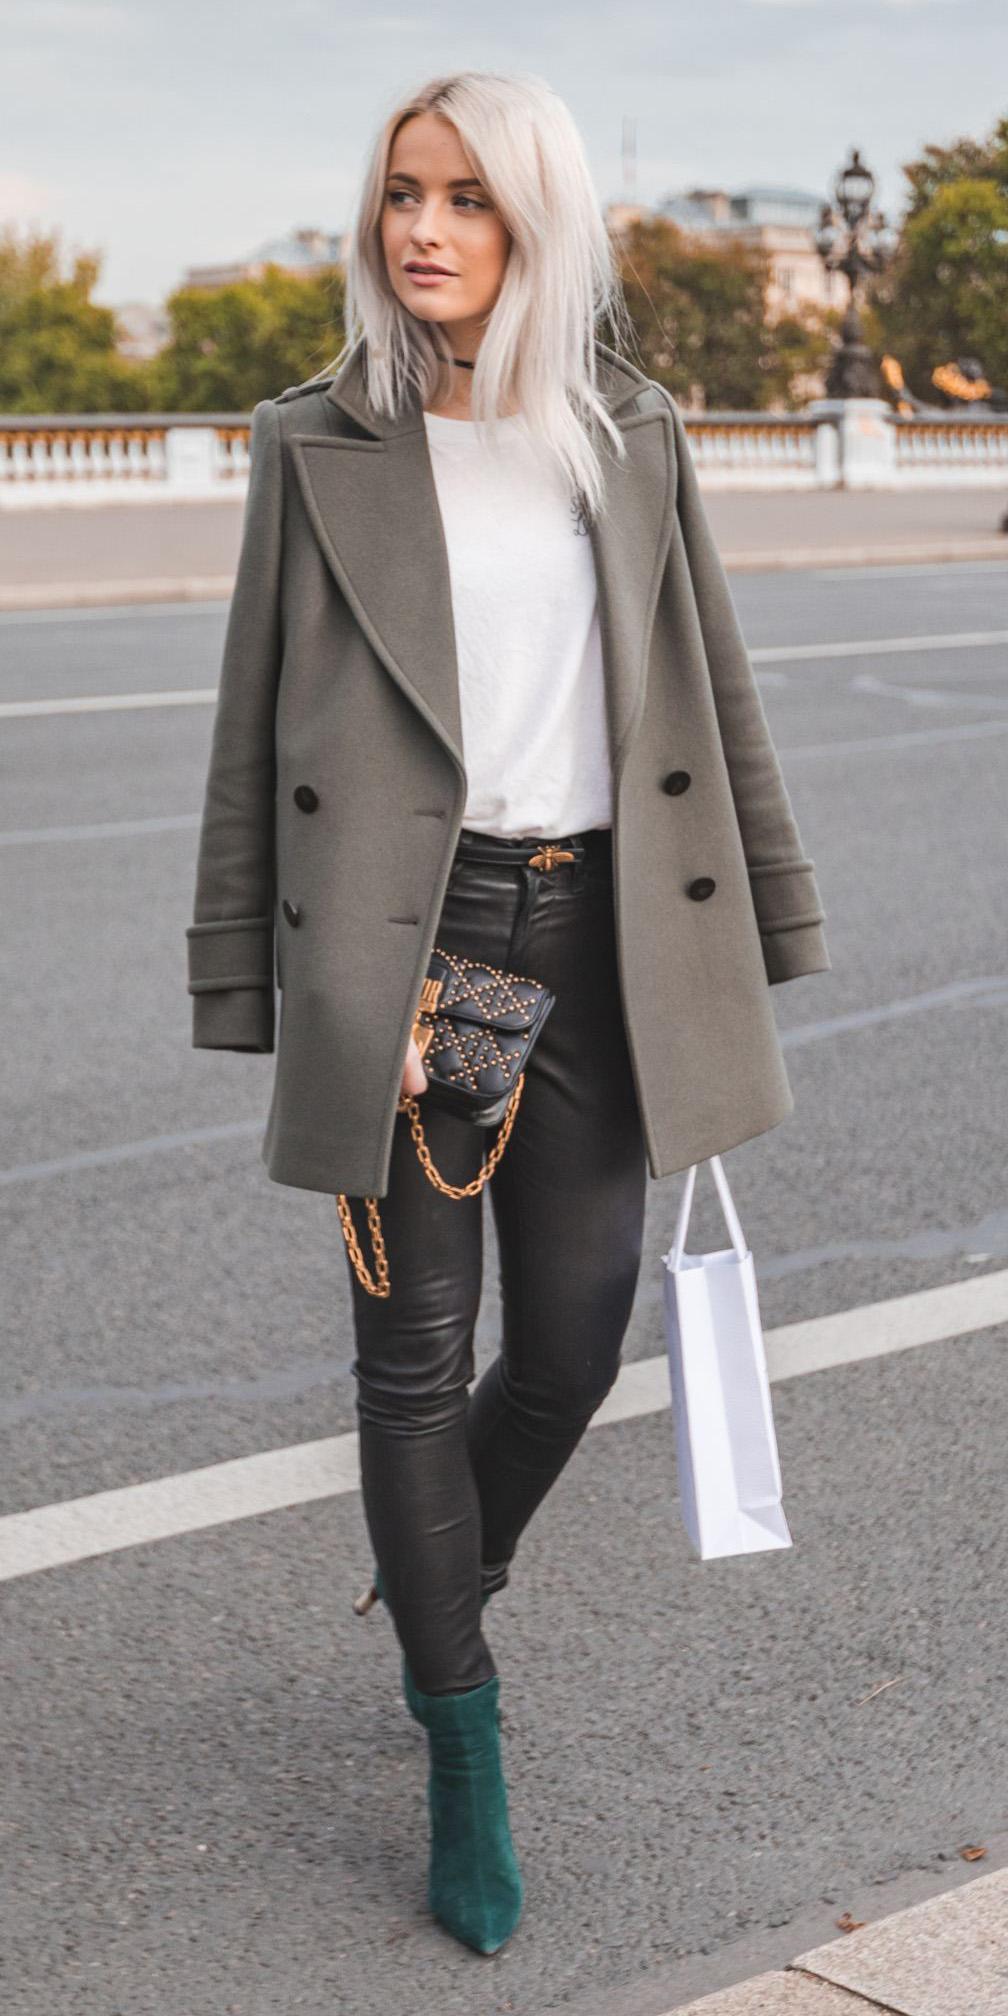 black-skinny-jeans-white-top-blonde-leather-grayd-jacket-coat-peacoat-green-shoe-booties-fall-winter-lunch.jpg